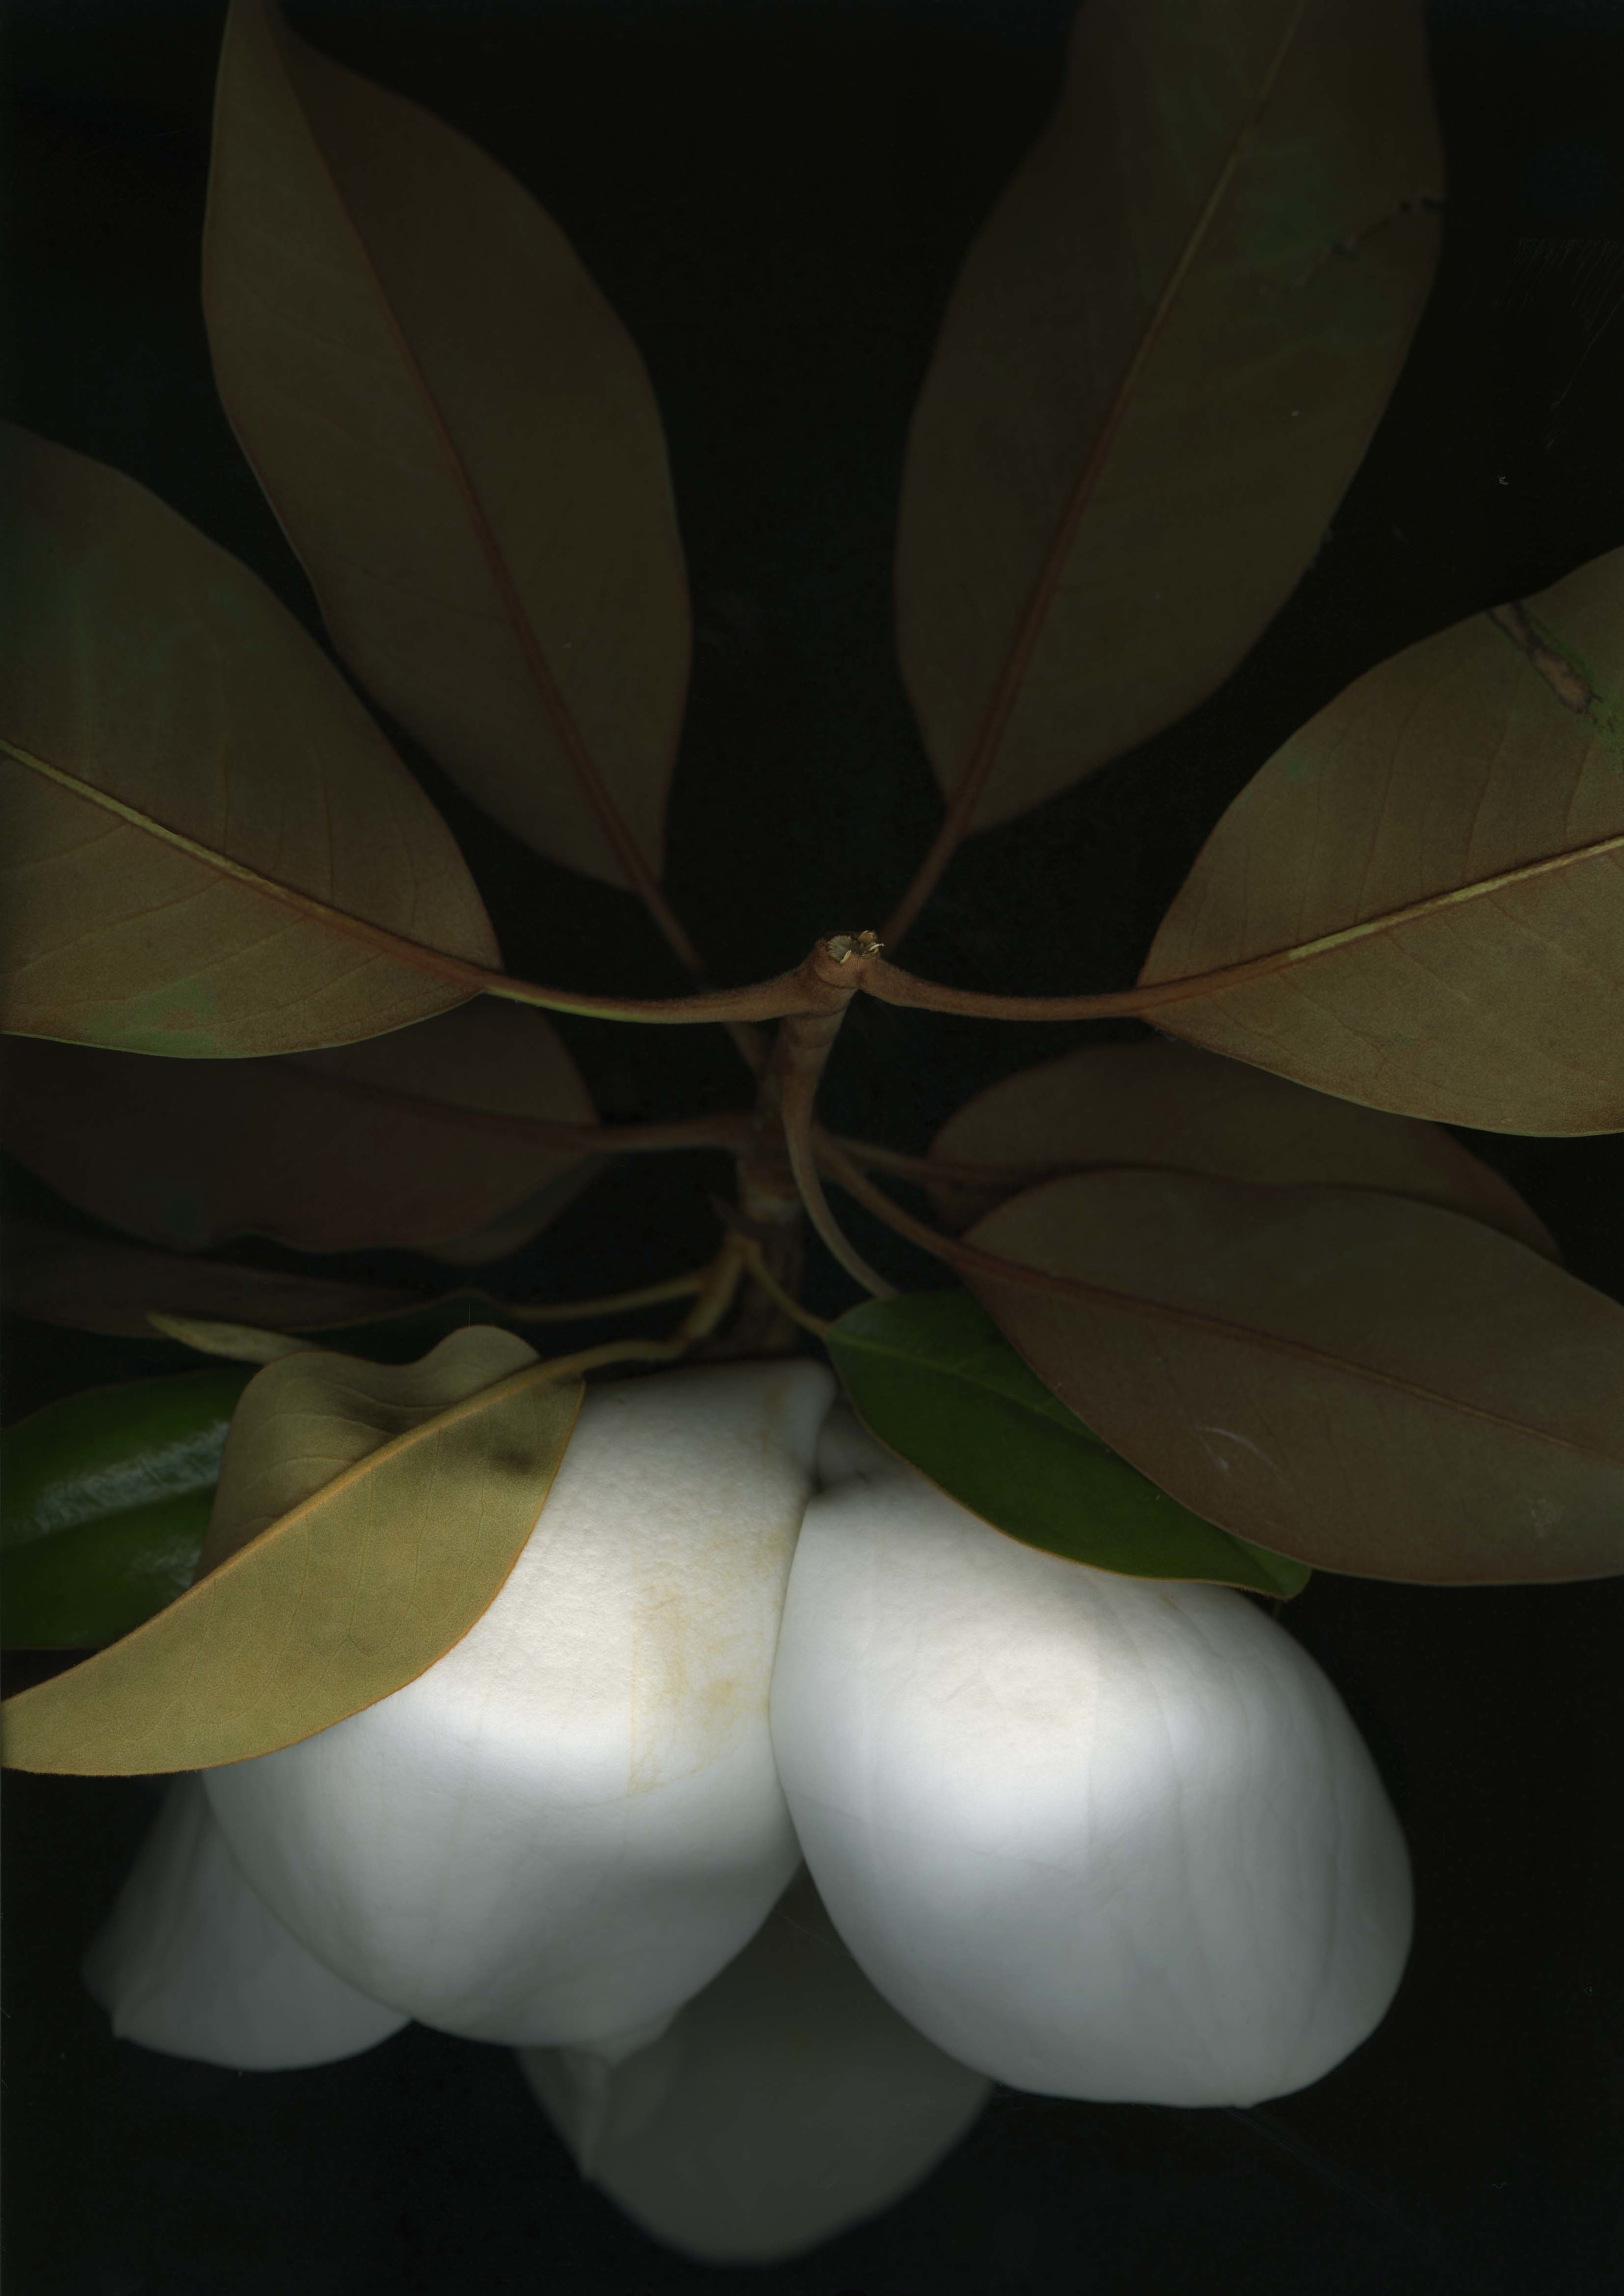 magnolia_4.jpg